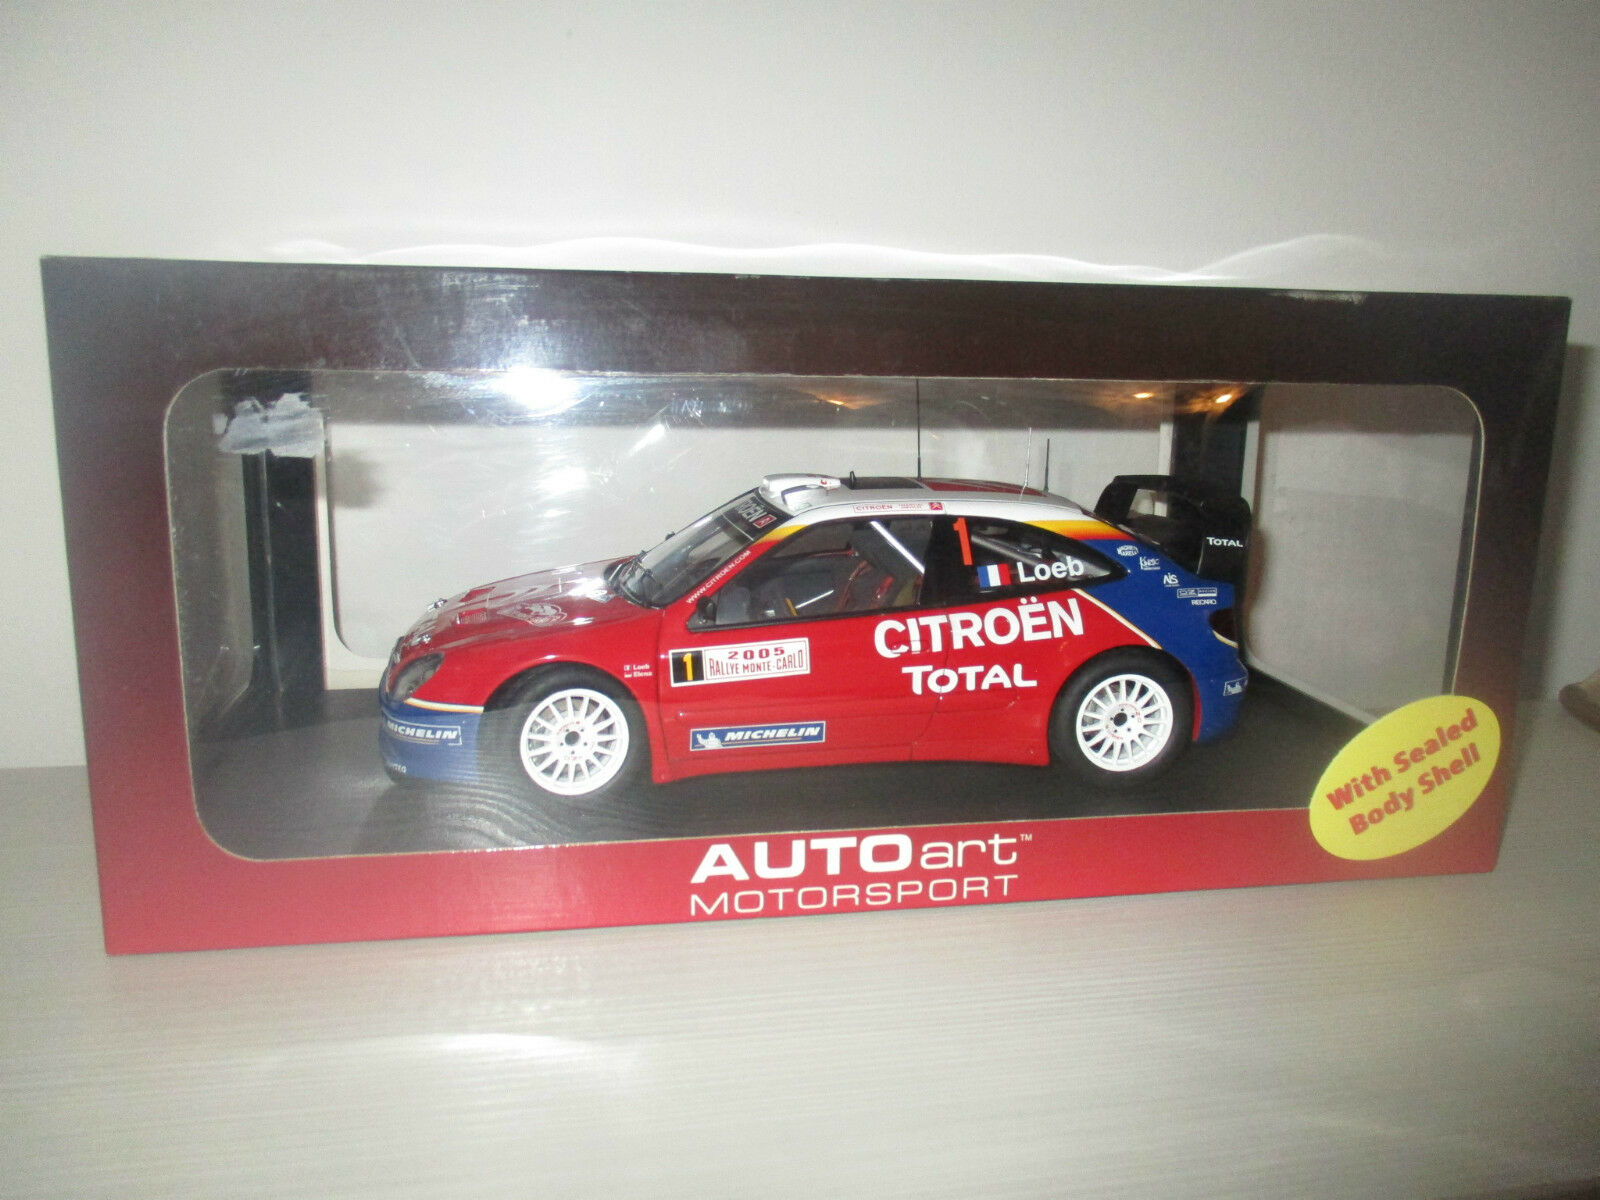 CITROEN XSARA WRC 2005 RALLY MONTE CARLO AUTOART SCALA 1:18